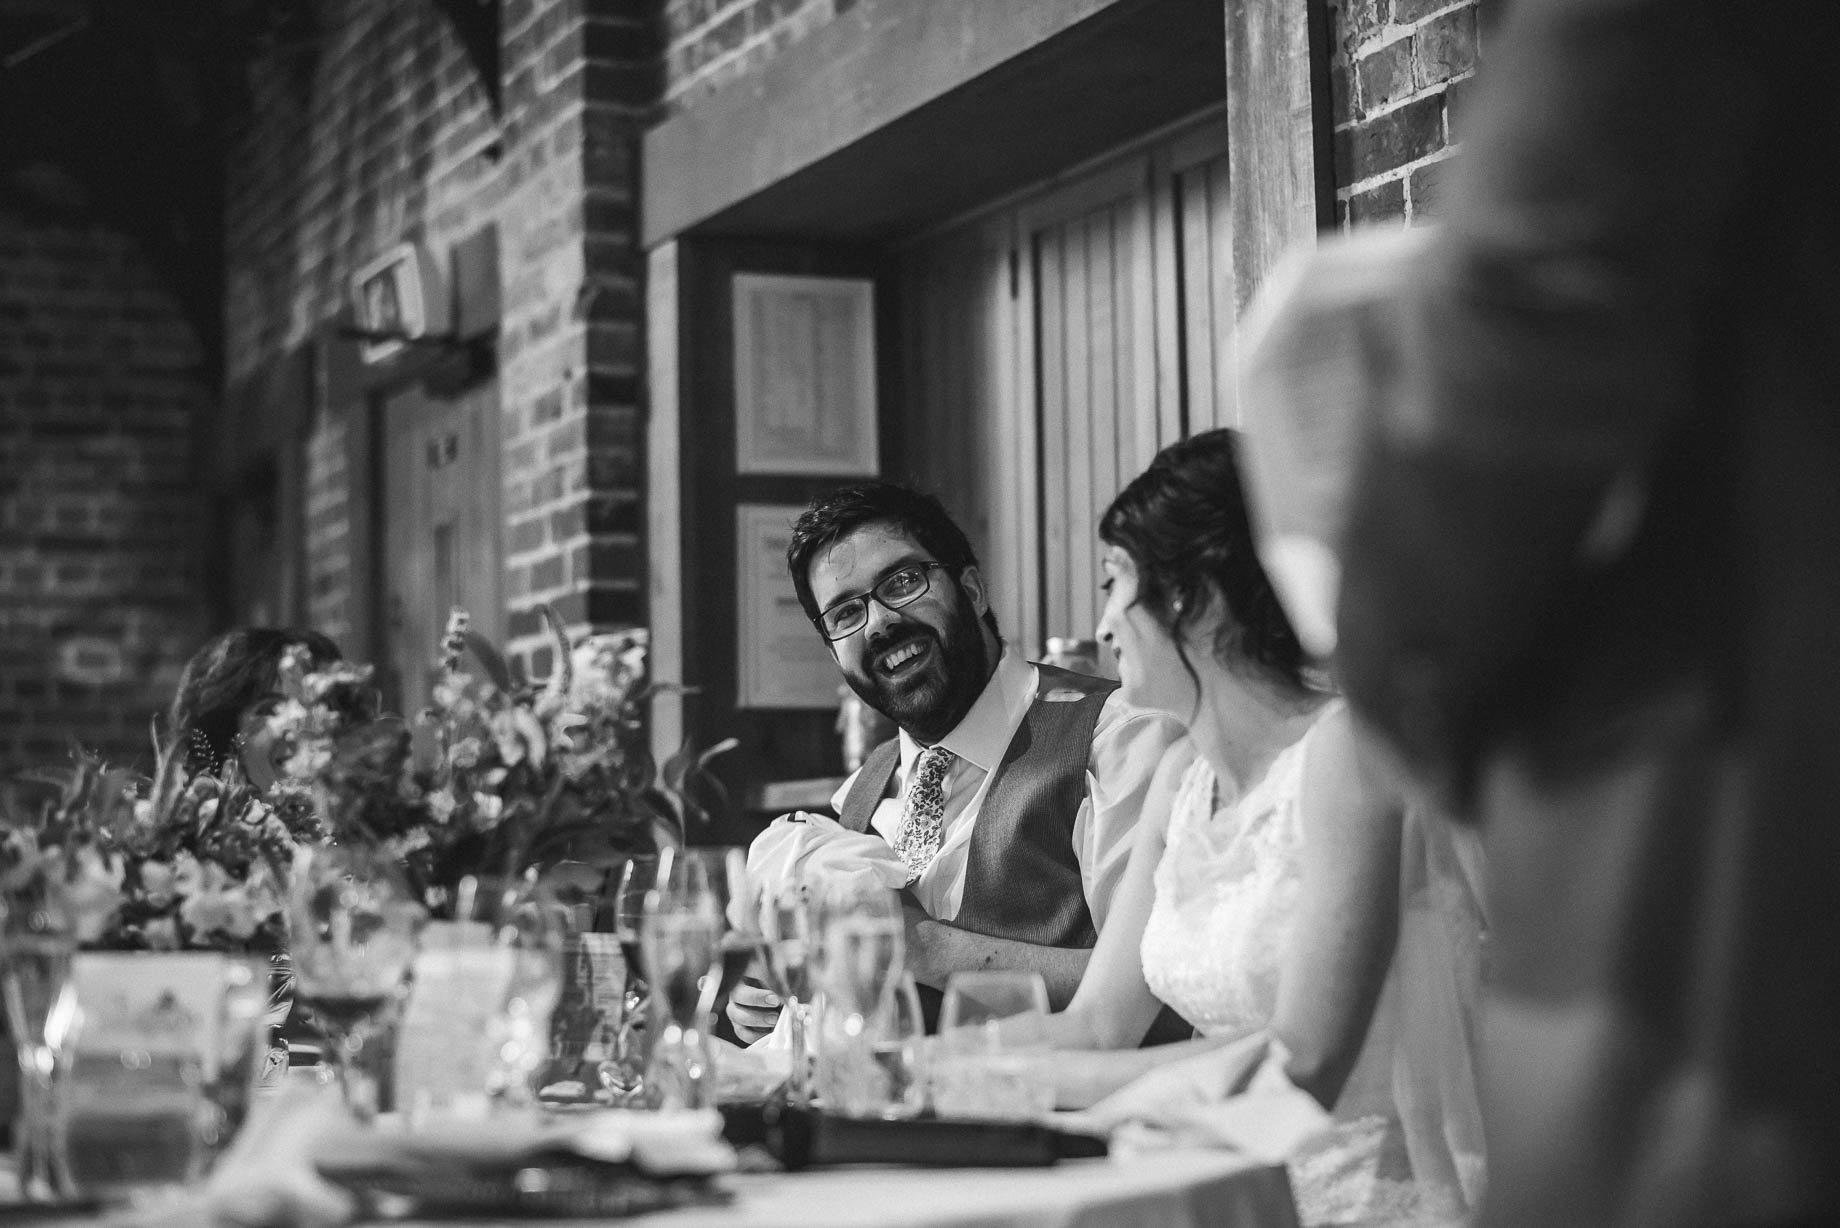 Gaynes Park wedding photography - Guy Collier Photography - Rachel and Jon (120 of 169)